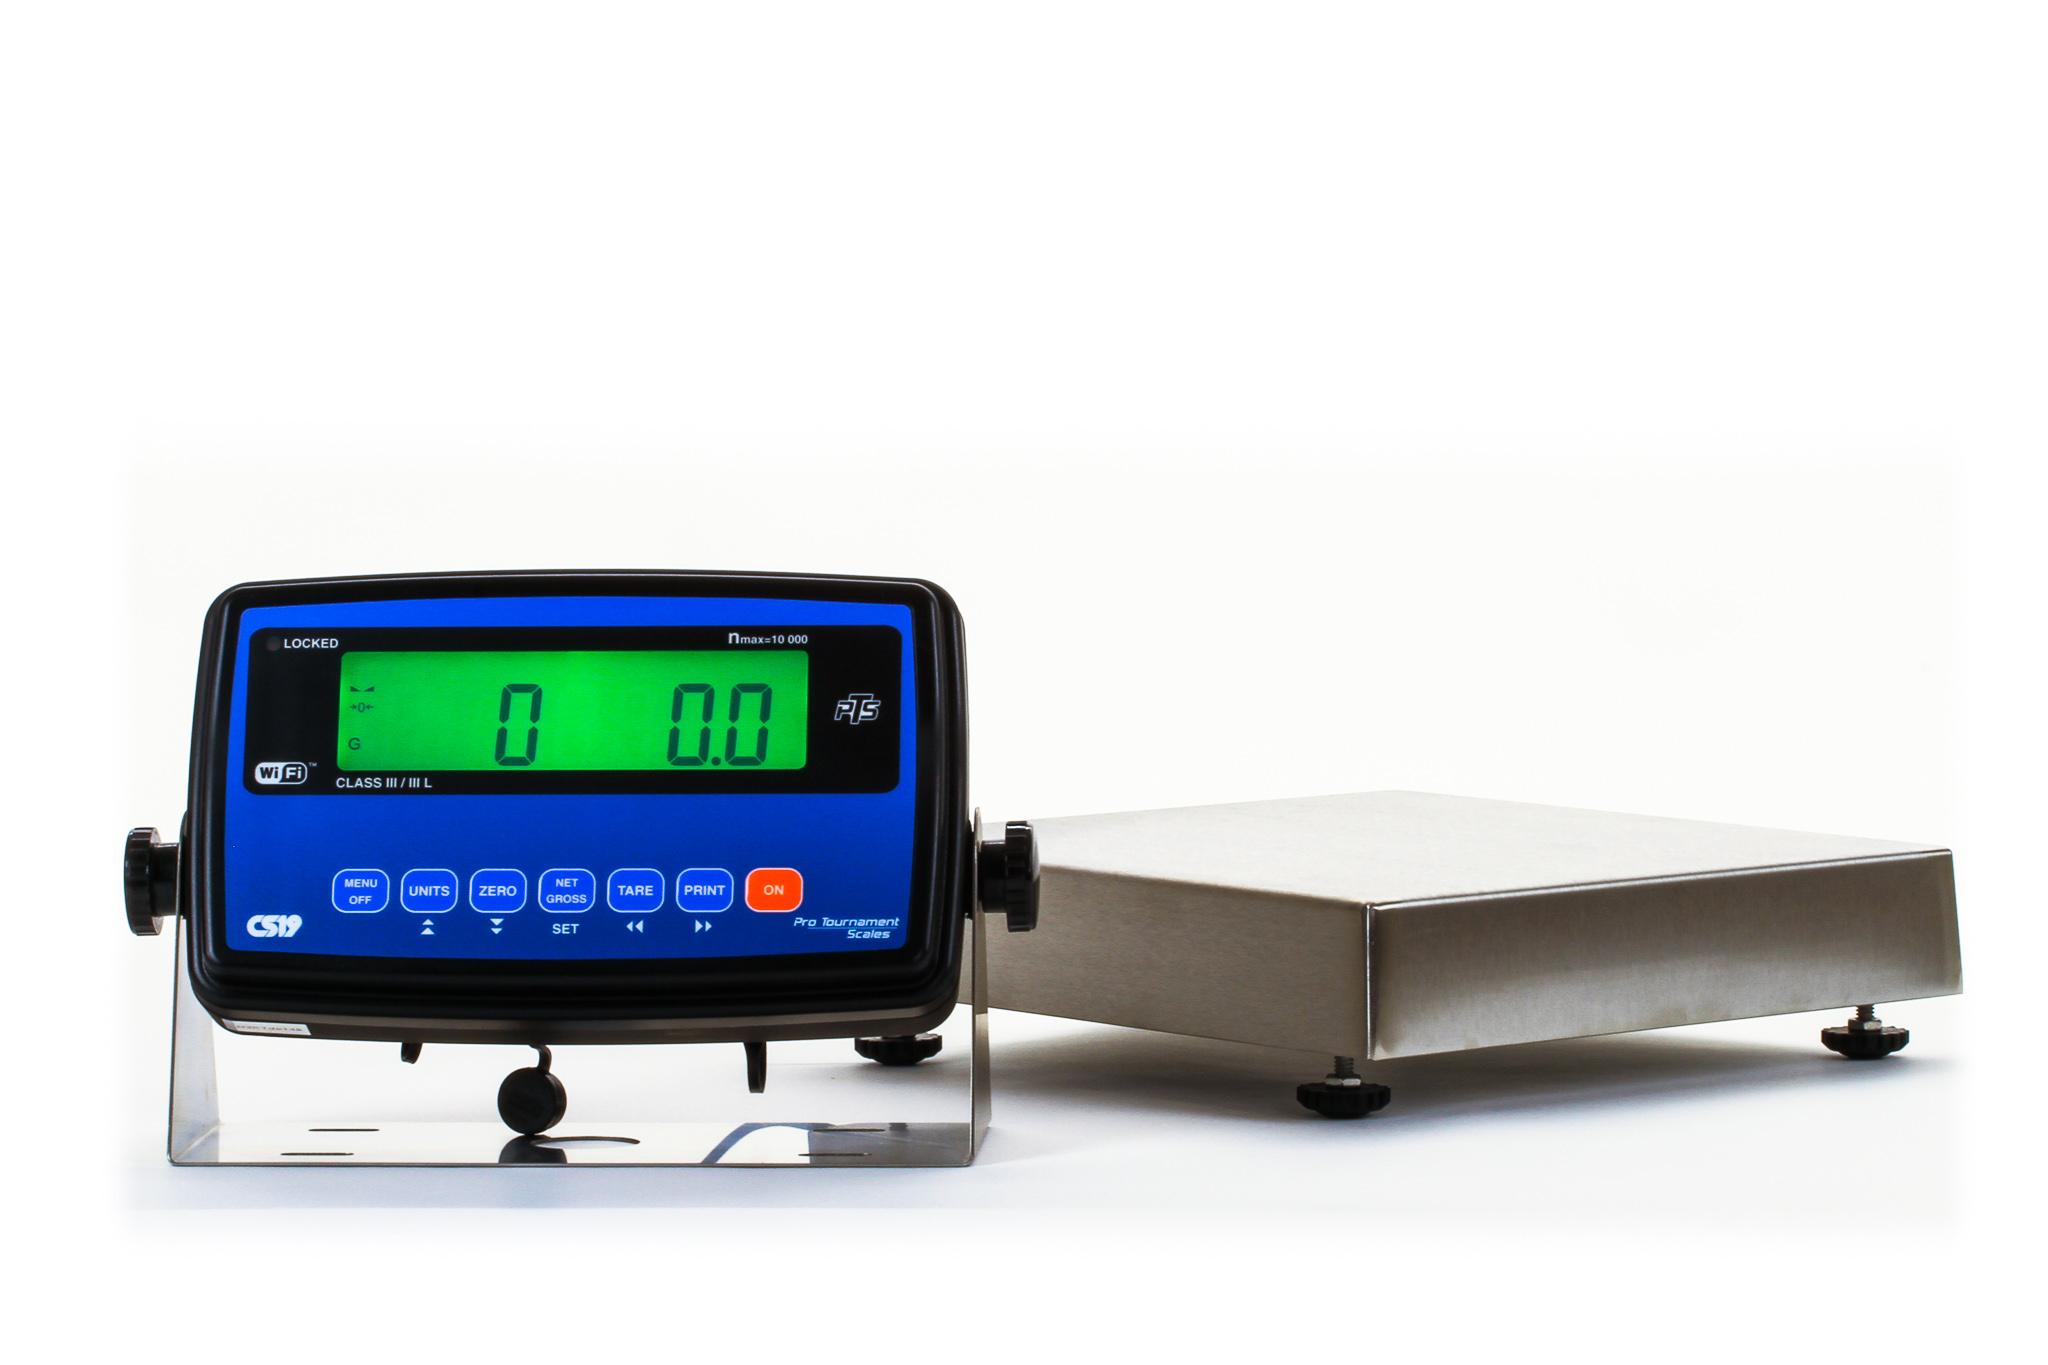 CS19 Scale and Platform